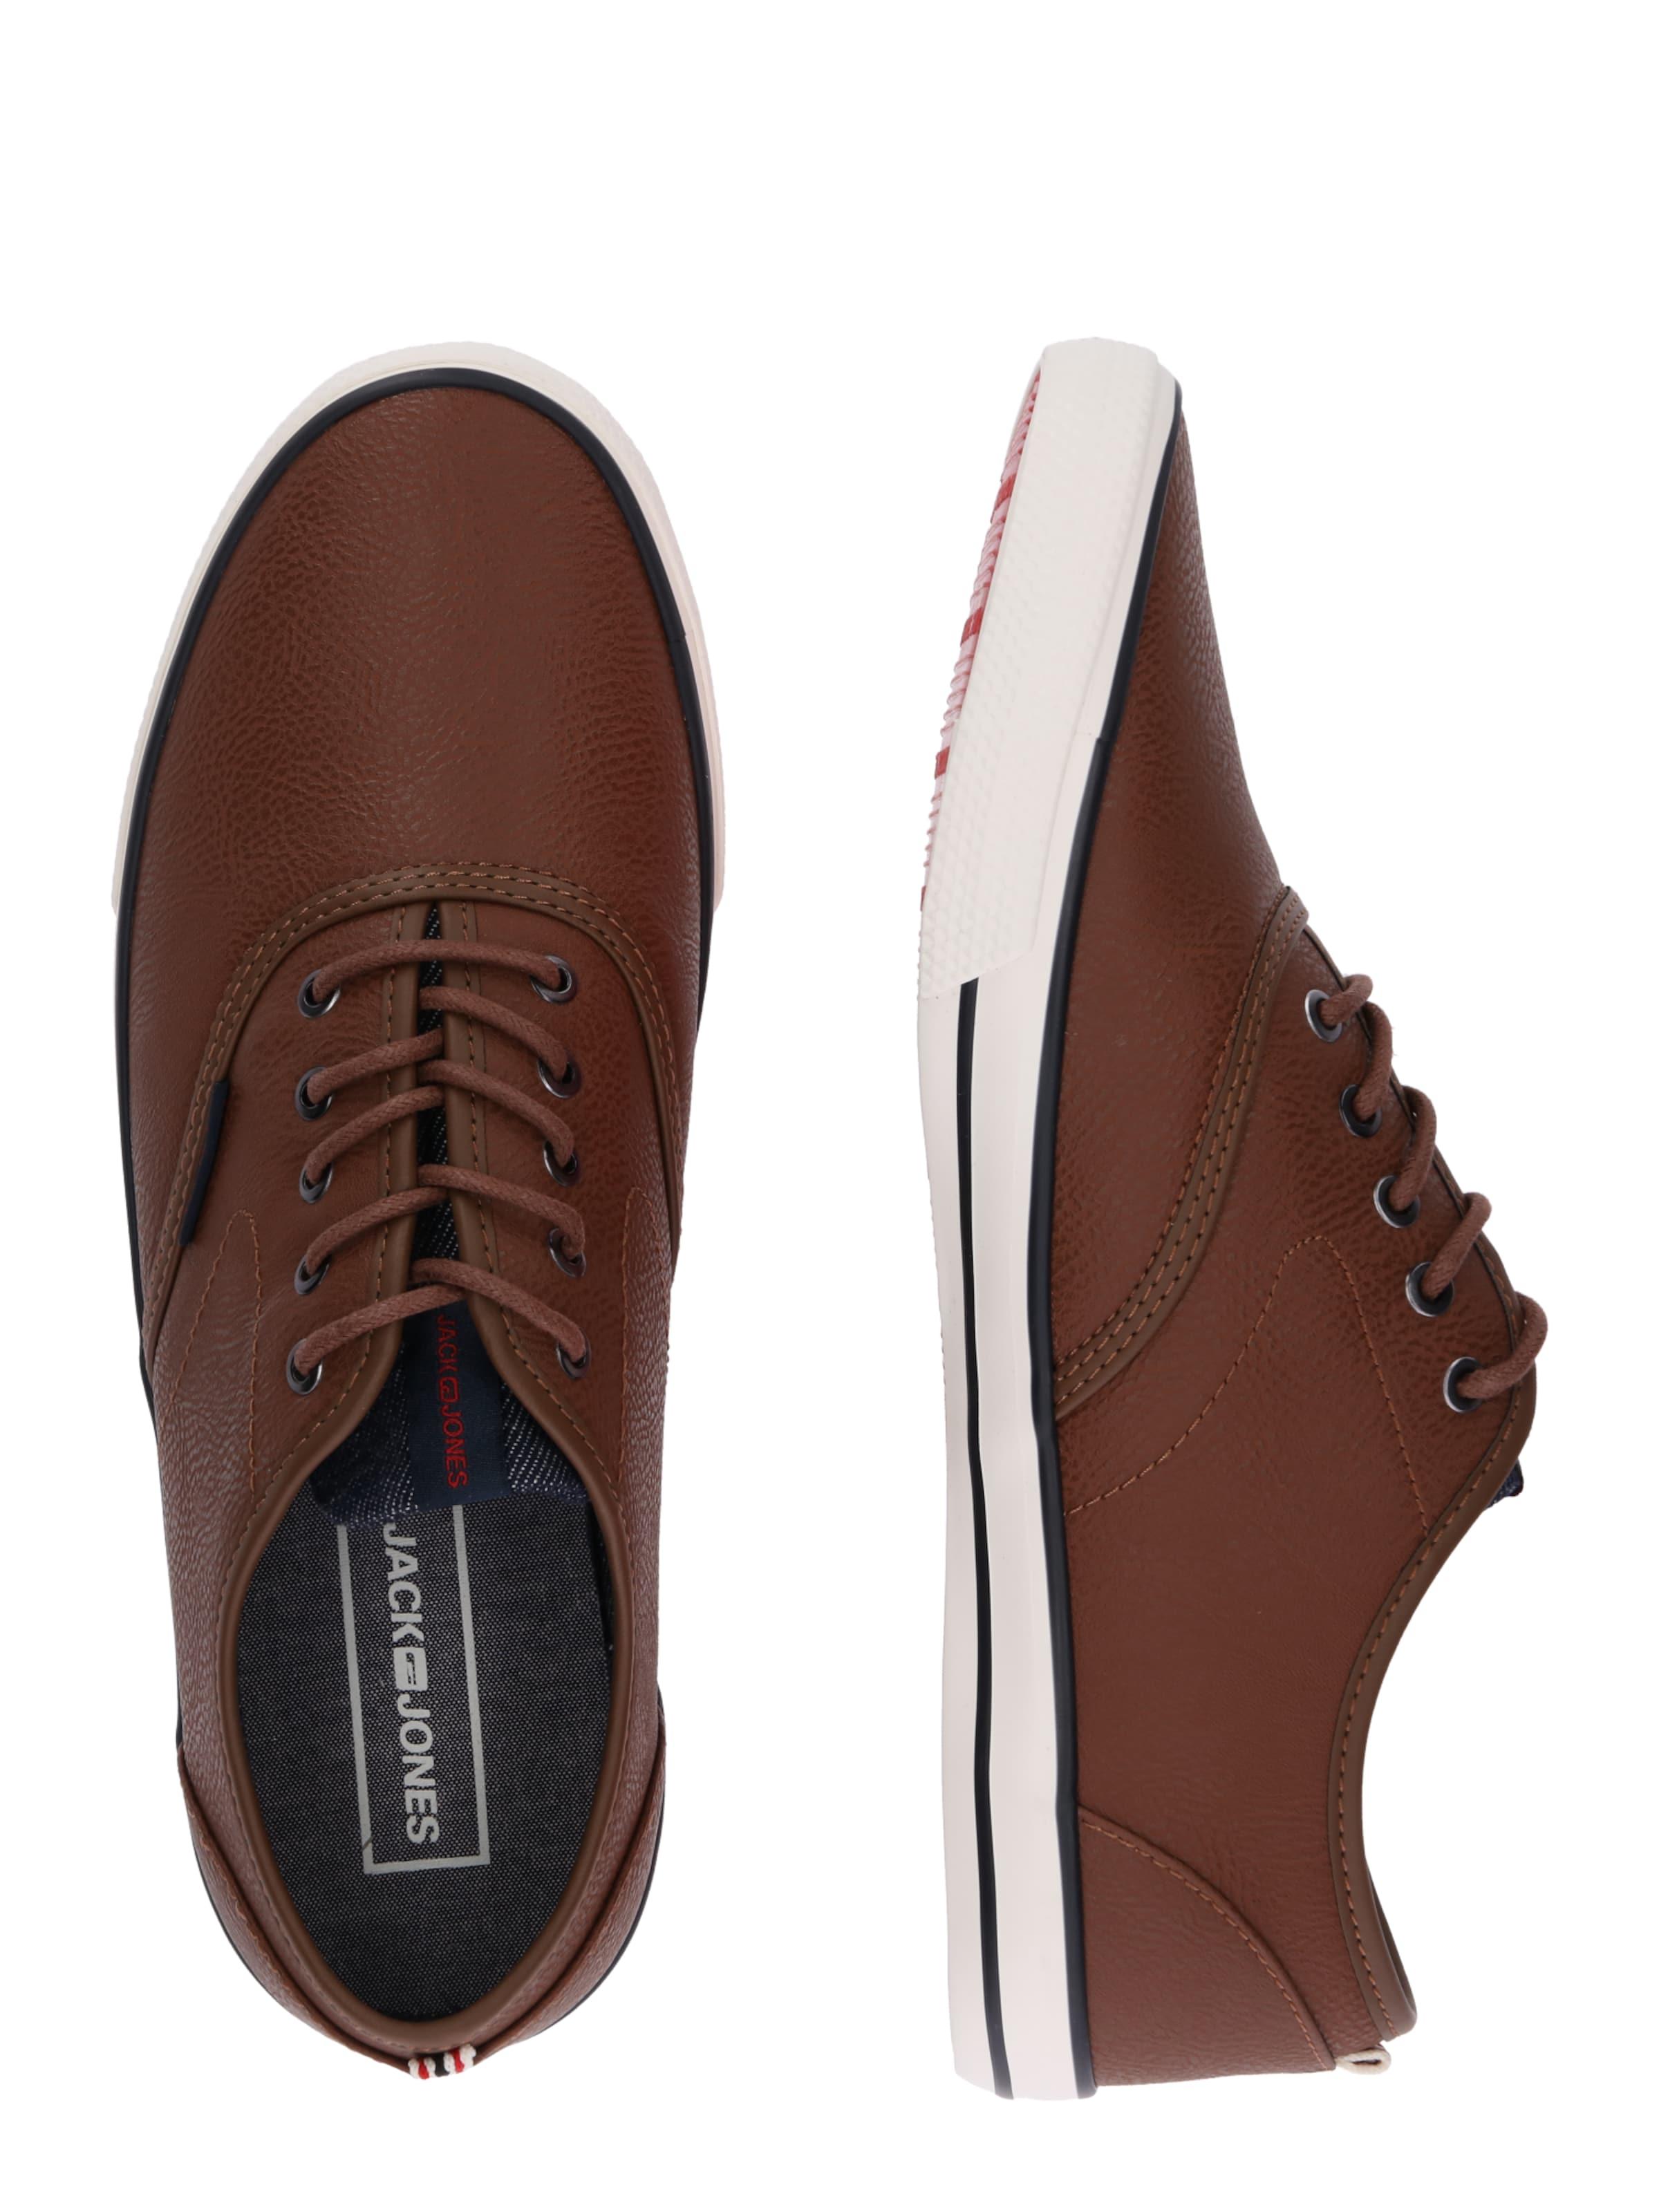 'mokkasin' Jackamp; In Sneaker Jones Cognac HWE2IYeD9b